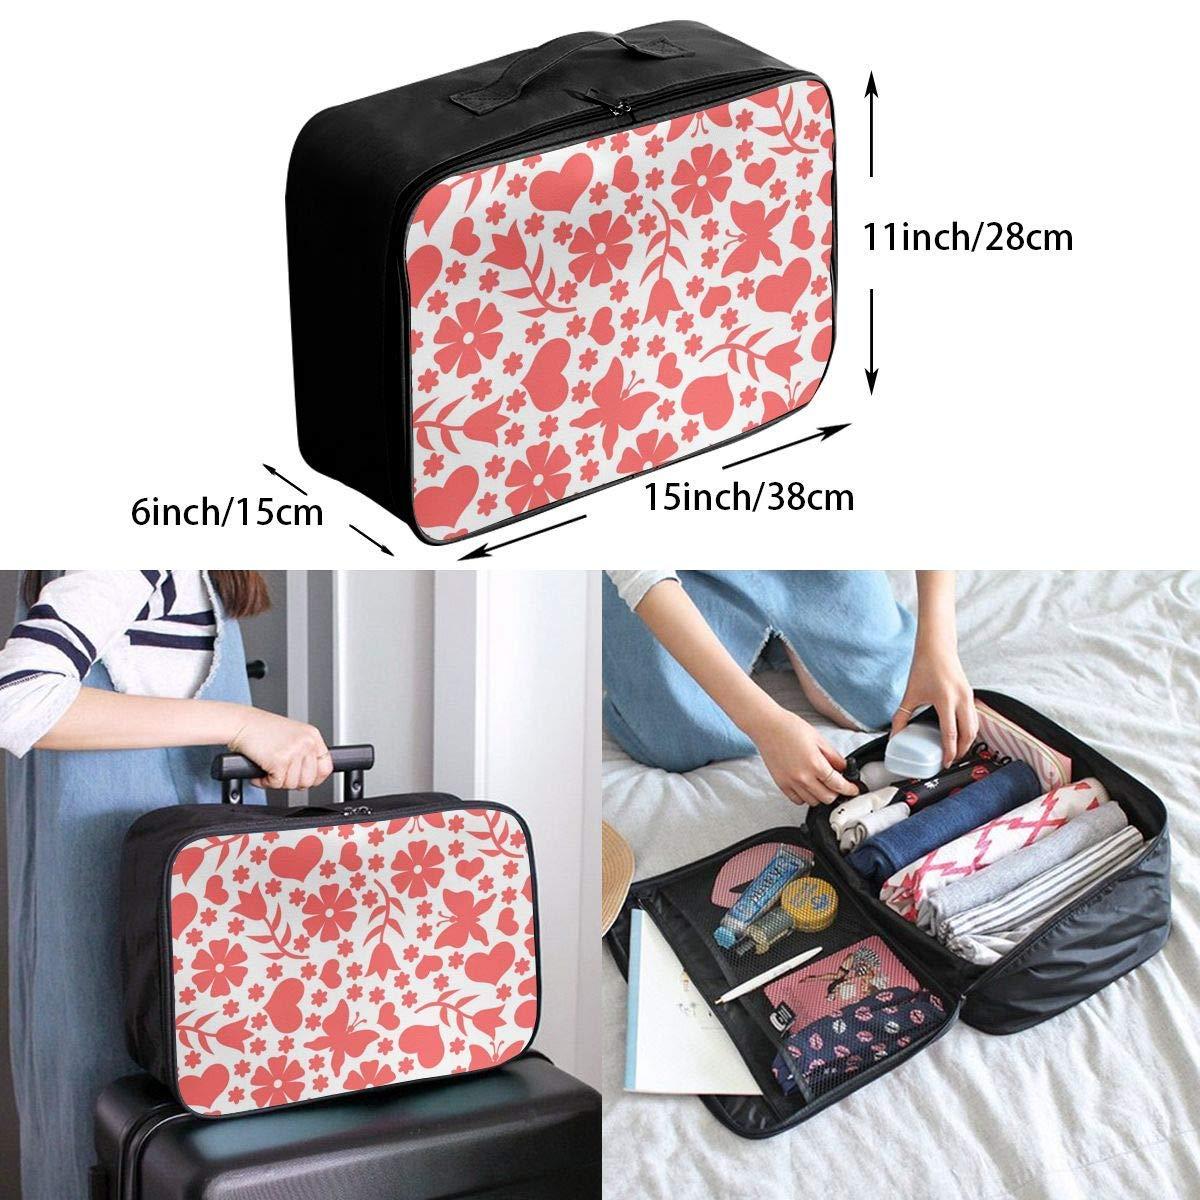 Travel Duffel Bag Waterproof Fashion Lightweight Large Capacity Portable Duffel Bag for Men /& Women JTRVW Luggage Bags for Travel Love Heart Patterns